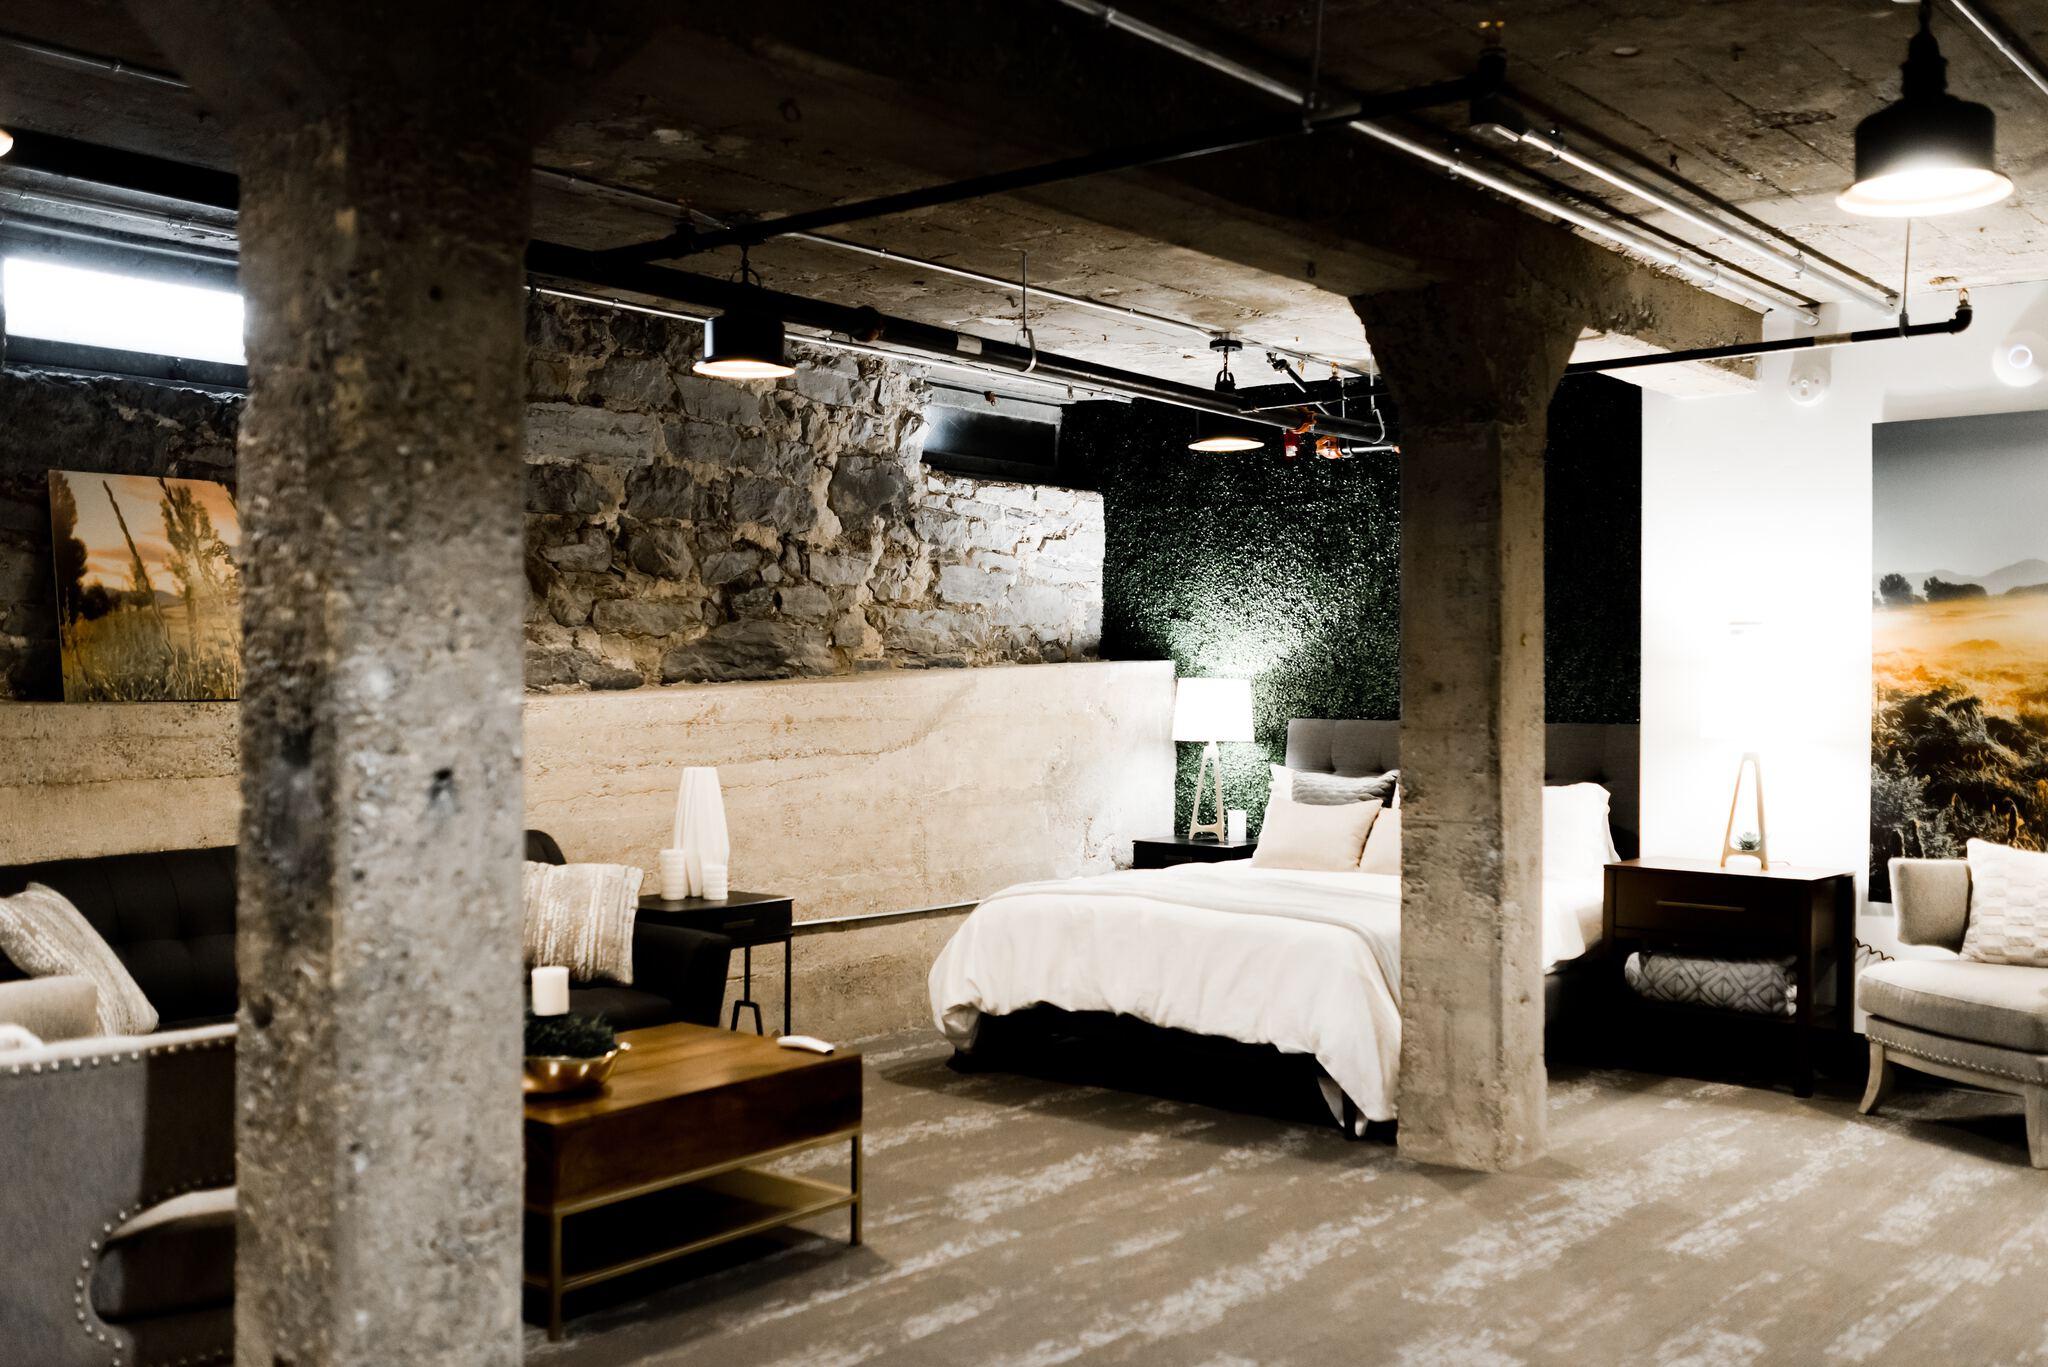 Zen Bedroom Ideas On A Budget The Ultimate Zen Guide In 2019